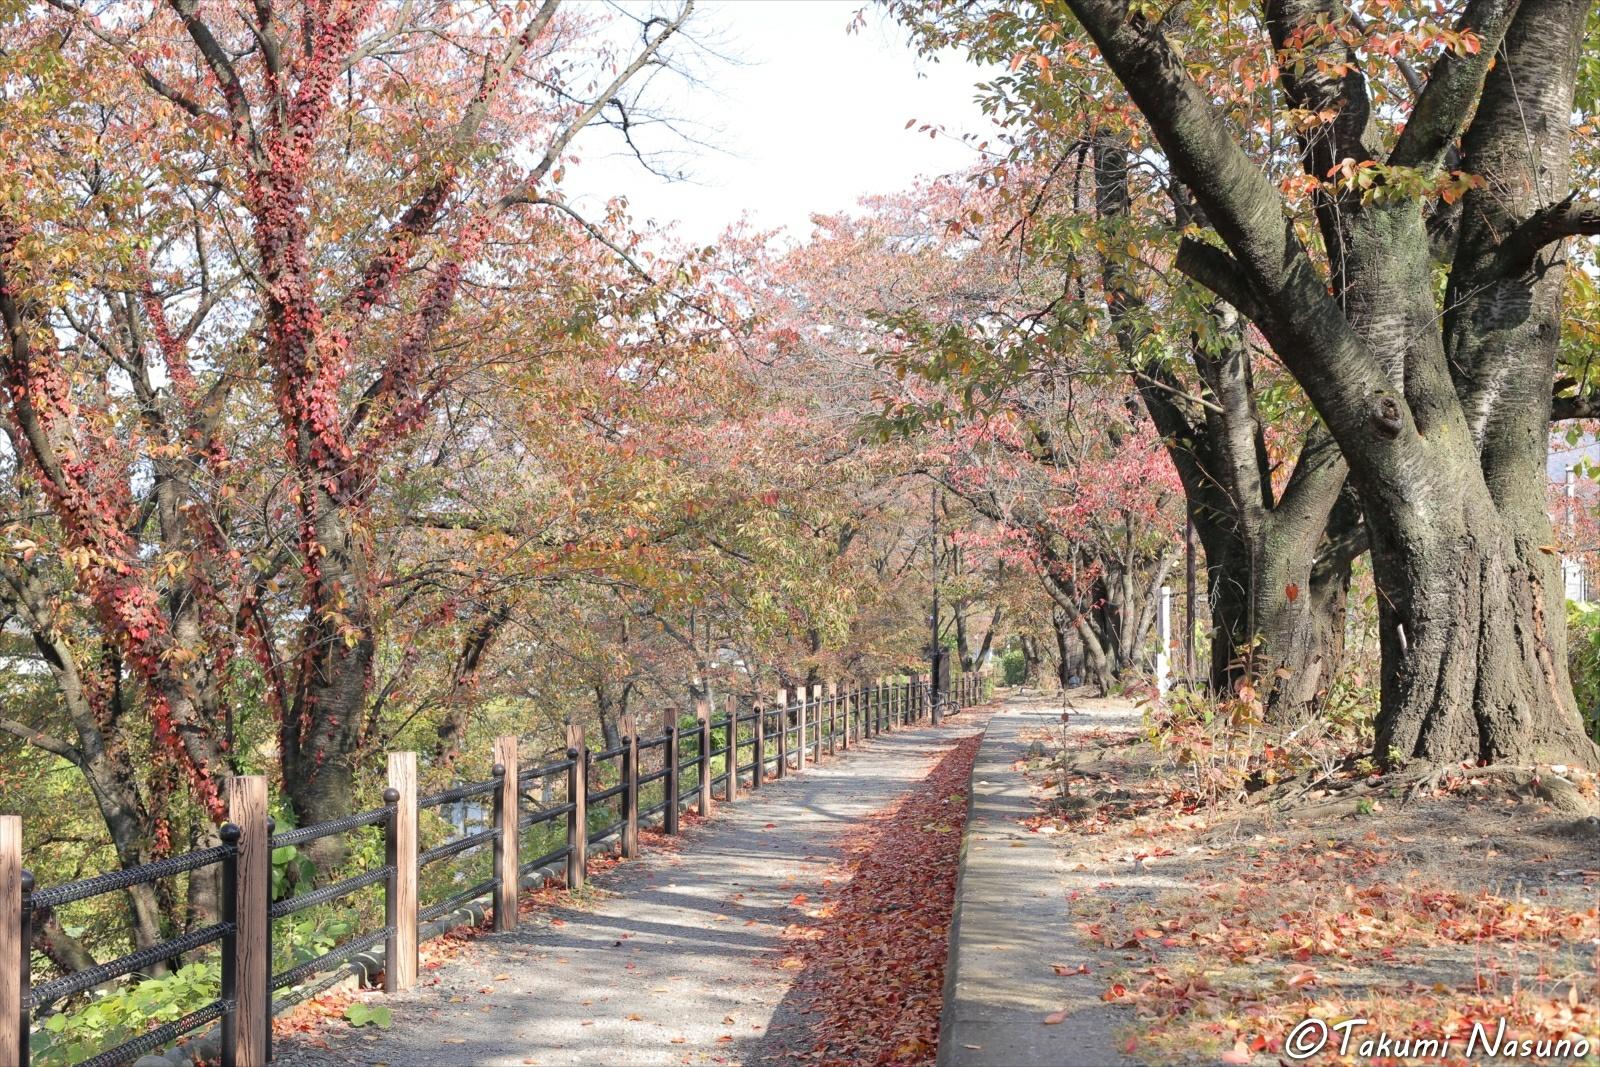 Autumn Colors near Katsunuma Budoukyou Station